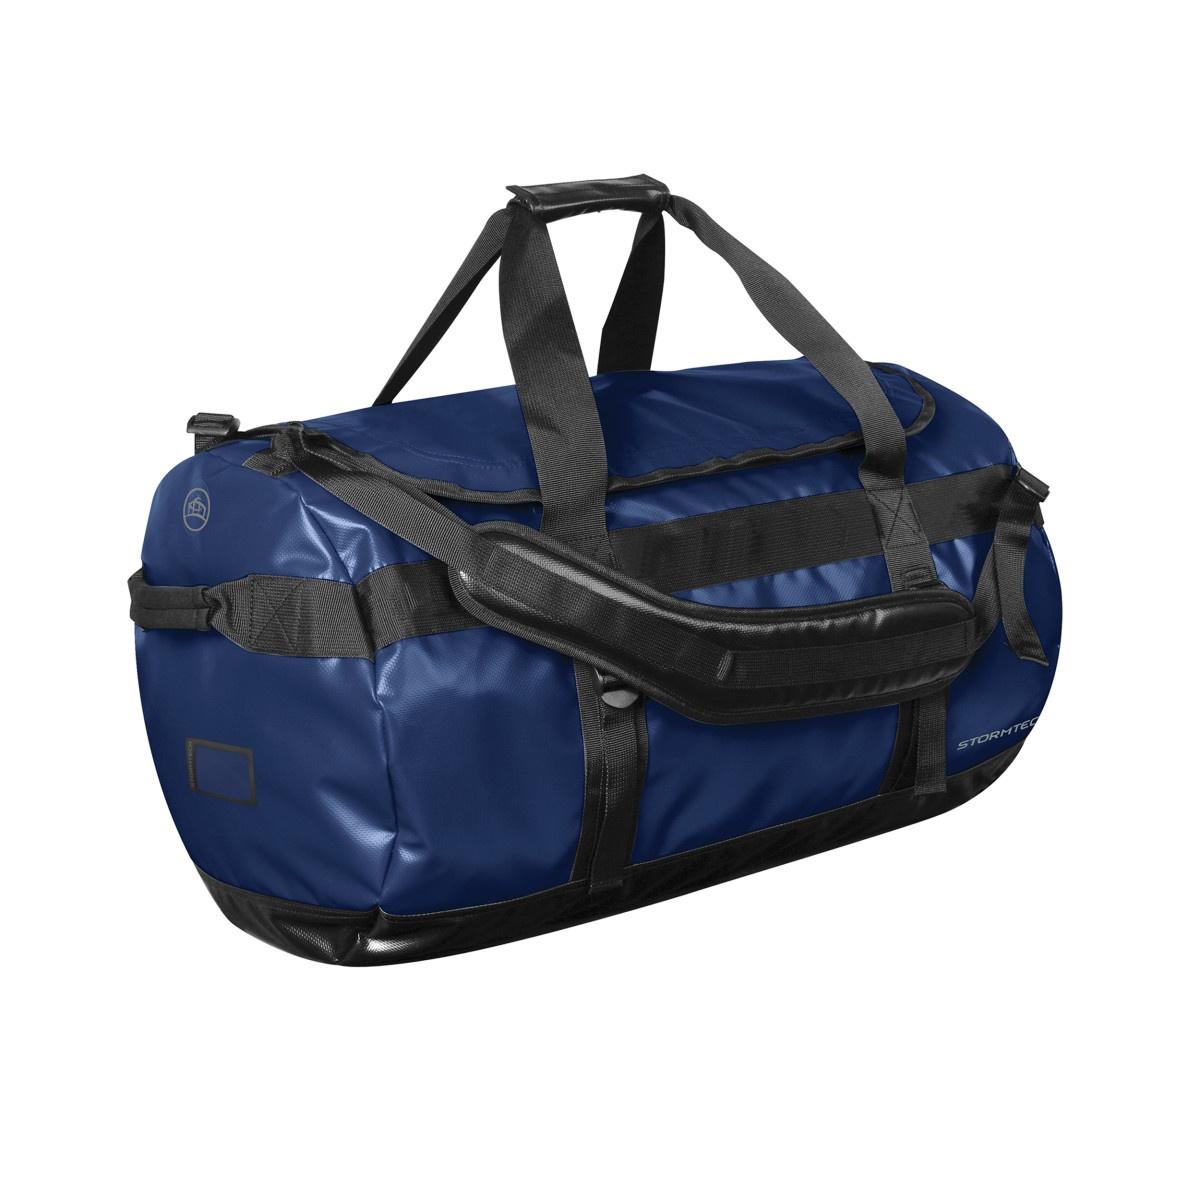 Stormtech Waterproof Gear Holdall Bag (Large) (Pack of 2) (One Size) (Ocean Blue/Black)